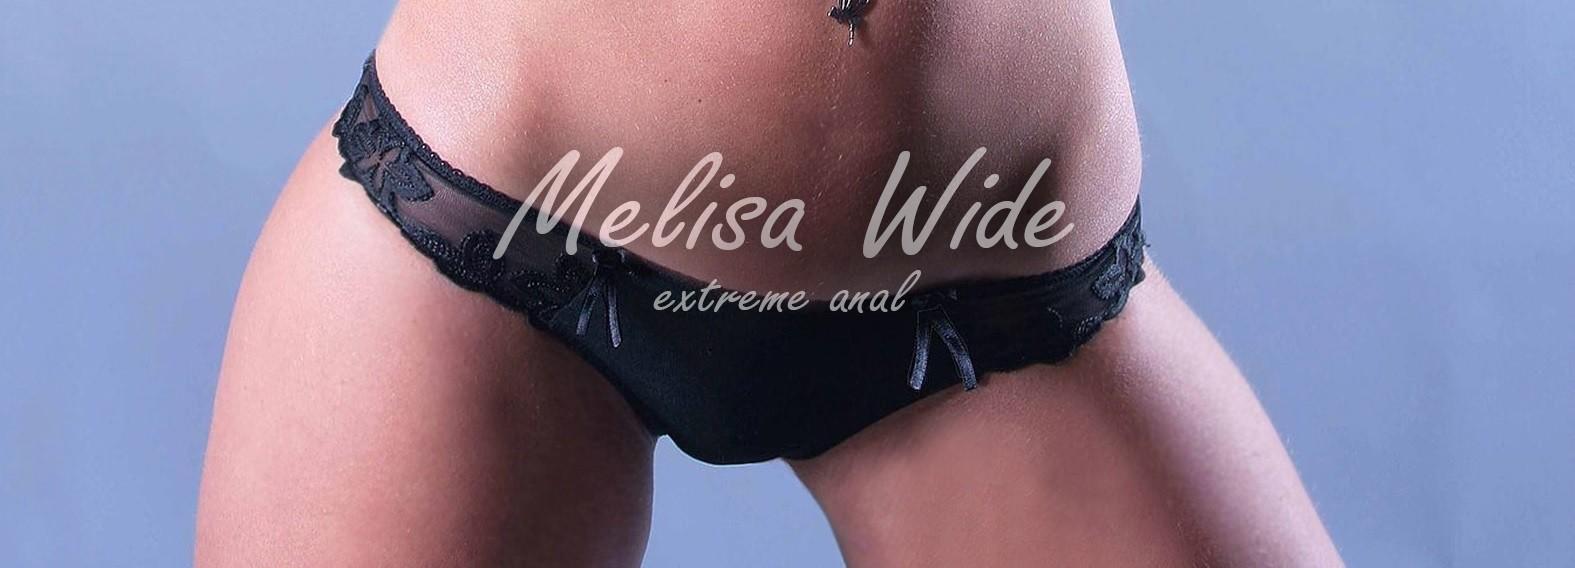 Melisa Wide Lname